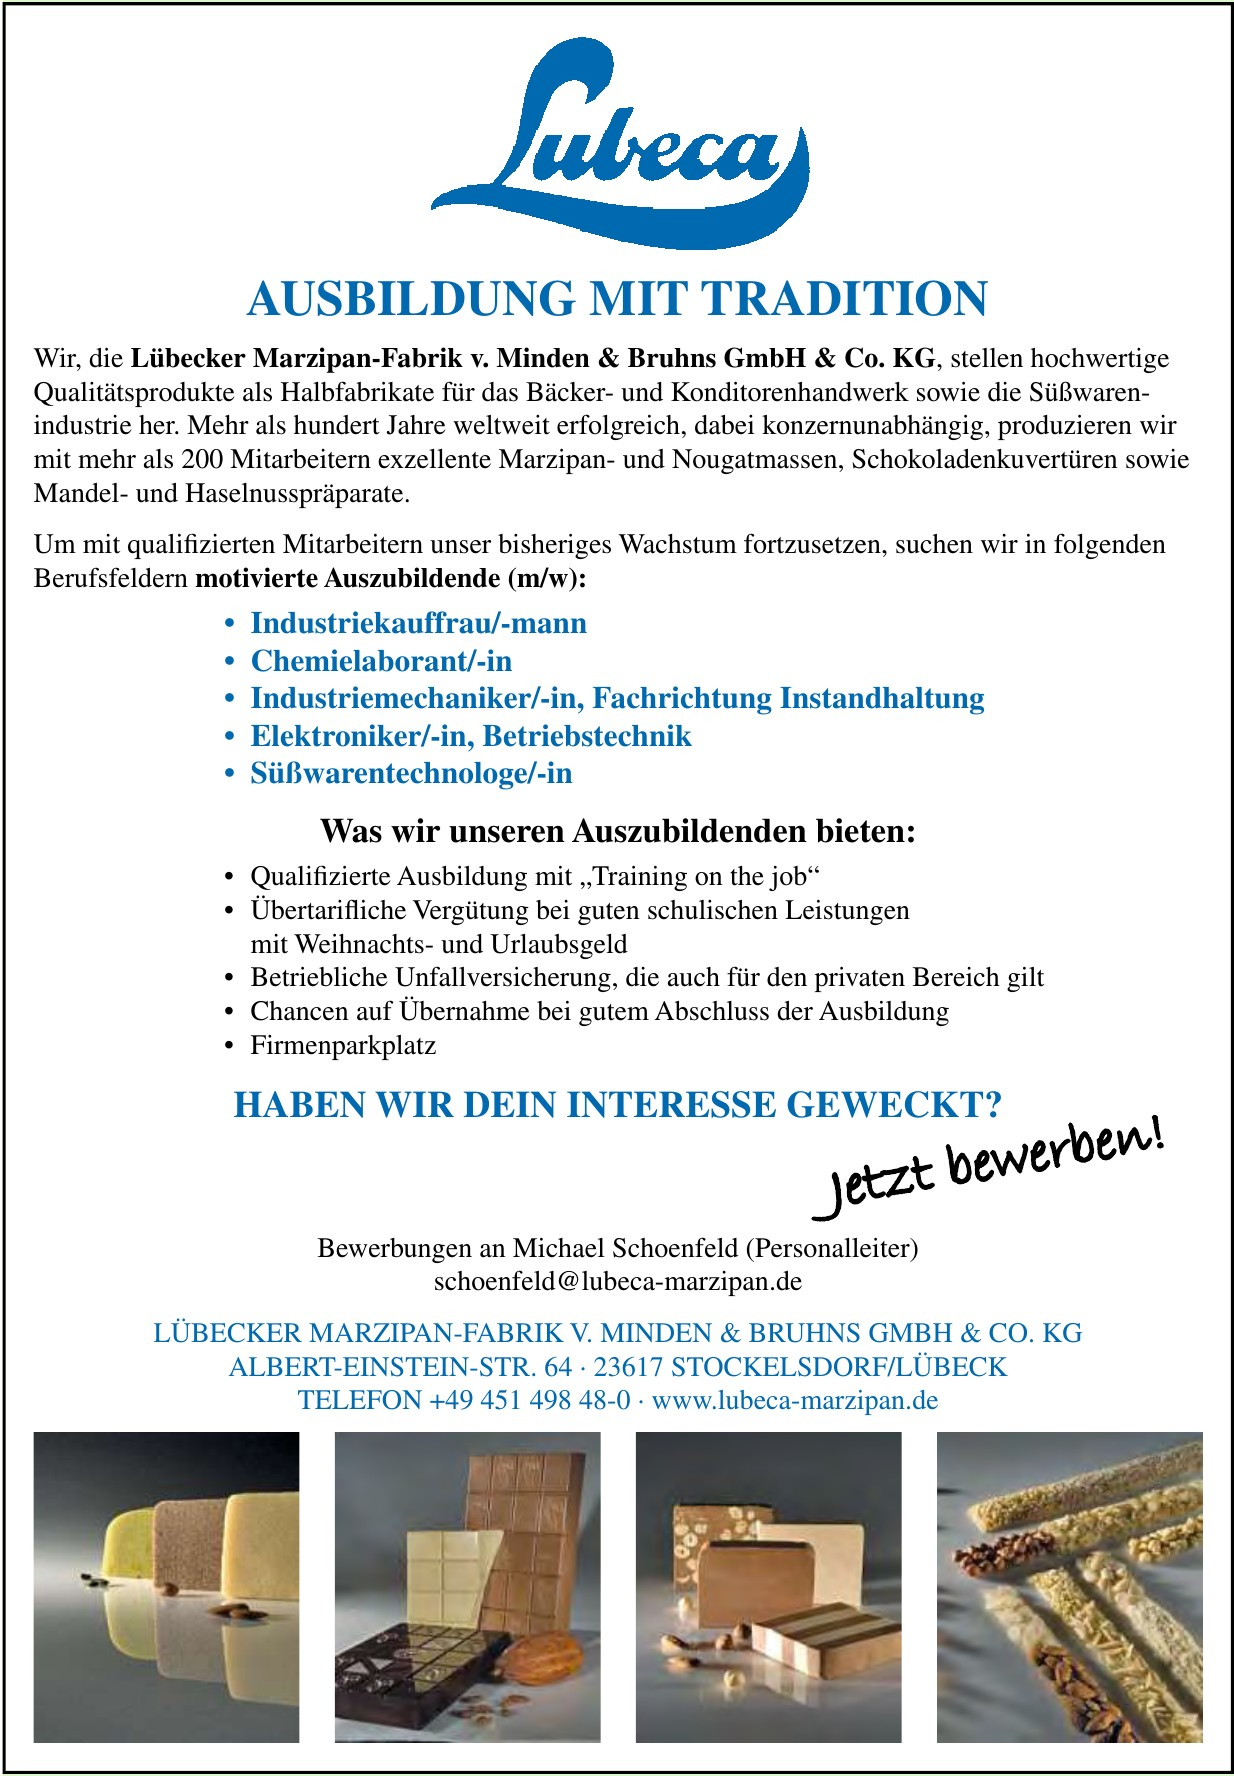 Lübecker Marzipan-Fabrik v. Minden & Bruhns GmbH & Co. KG